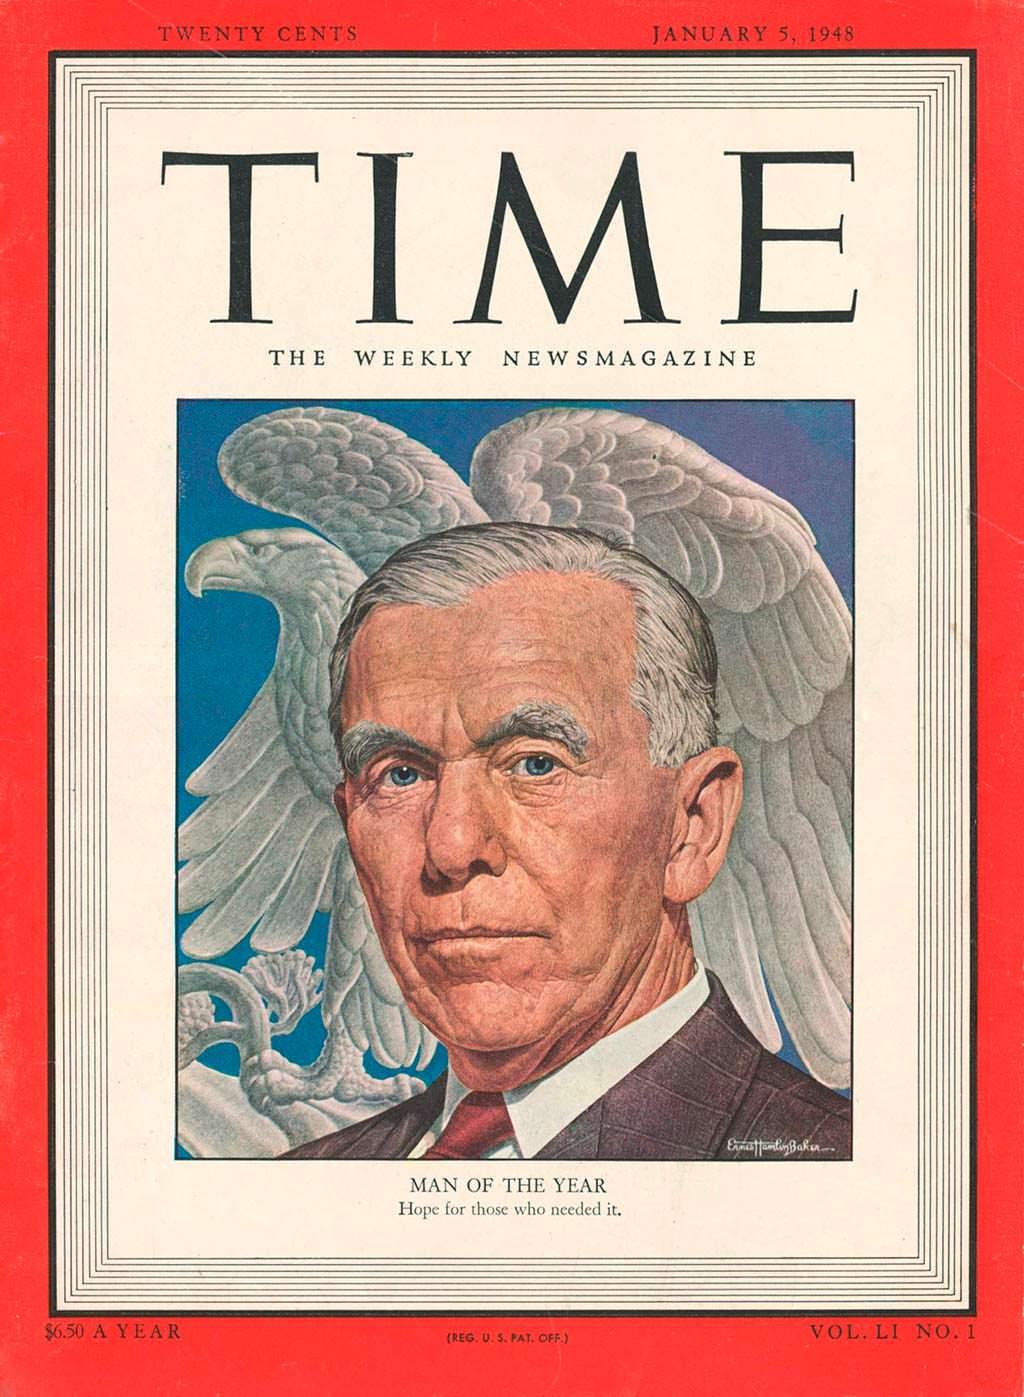 1947 год. Госсекретарь США Джордж Маршалл на обложке Time